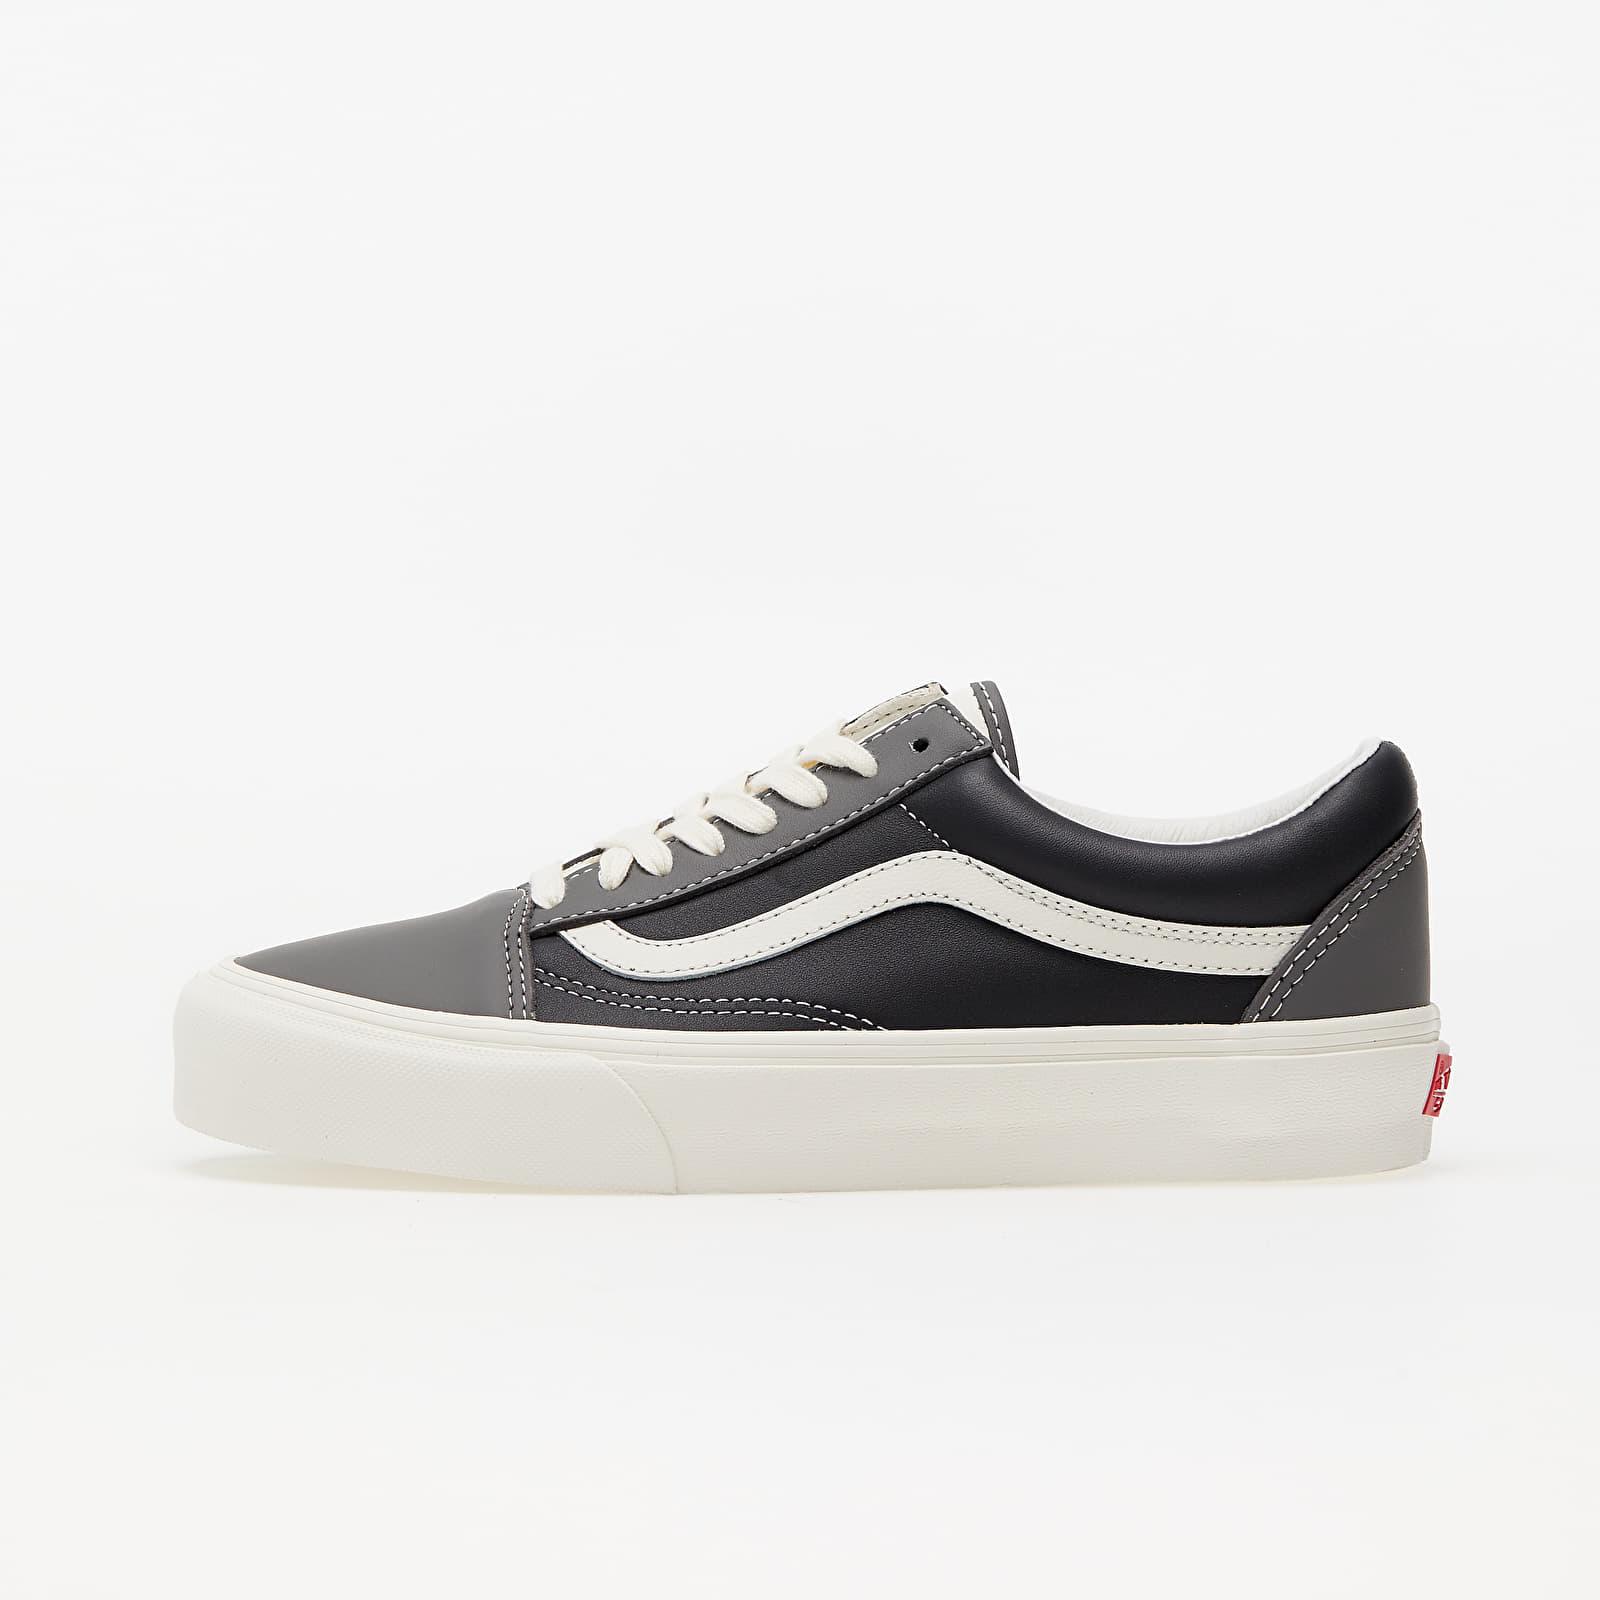 Vans Old Skool Vlt LX (Leather) Charcoal/ Black VN0A4BVF2TS1